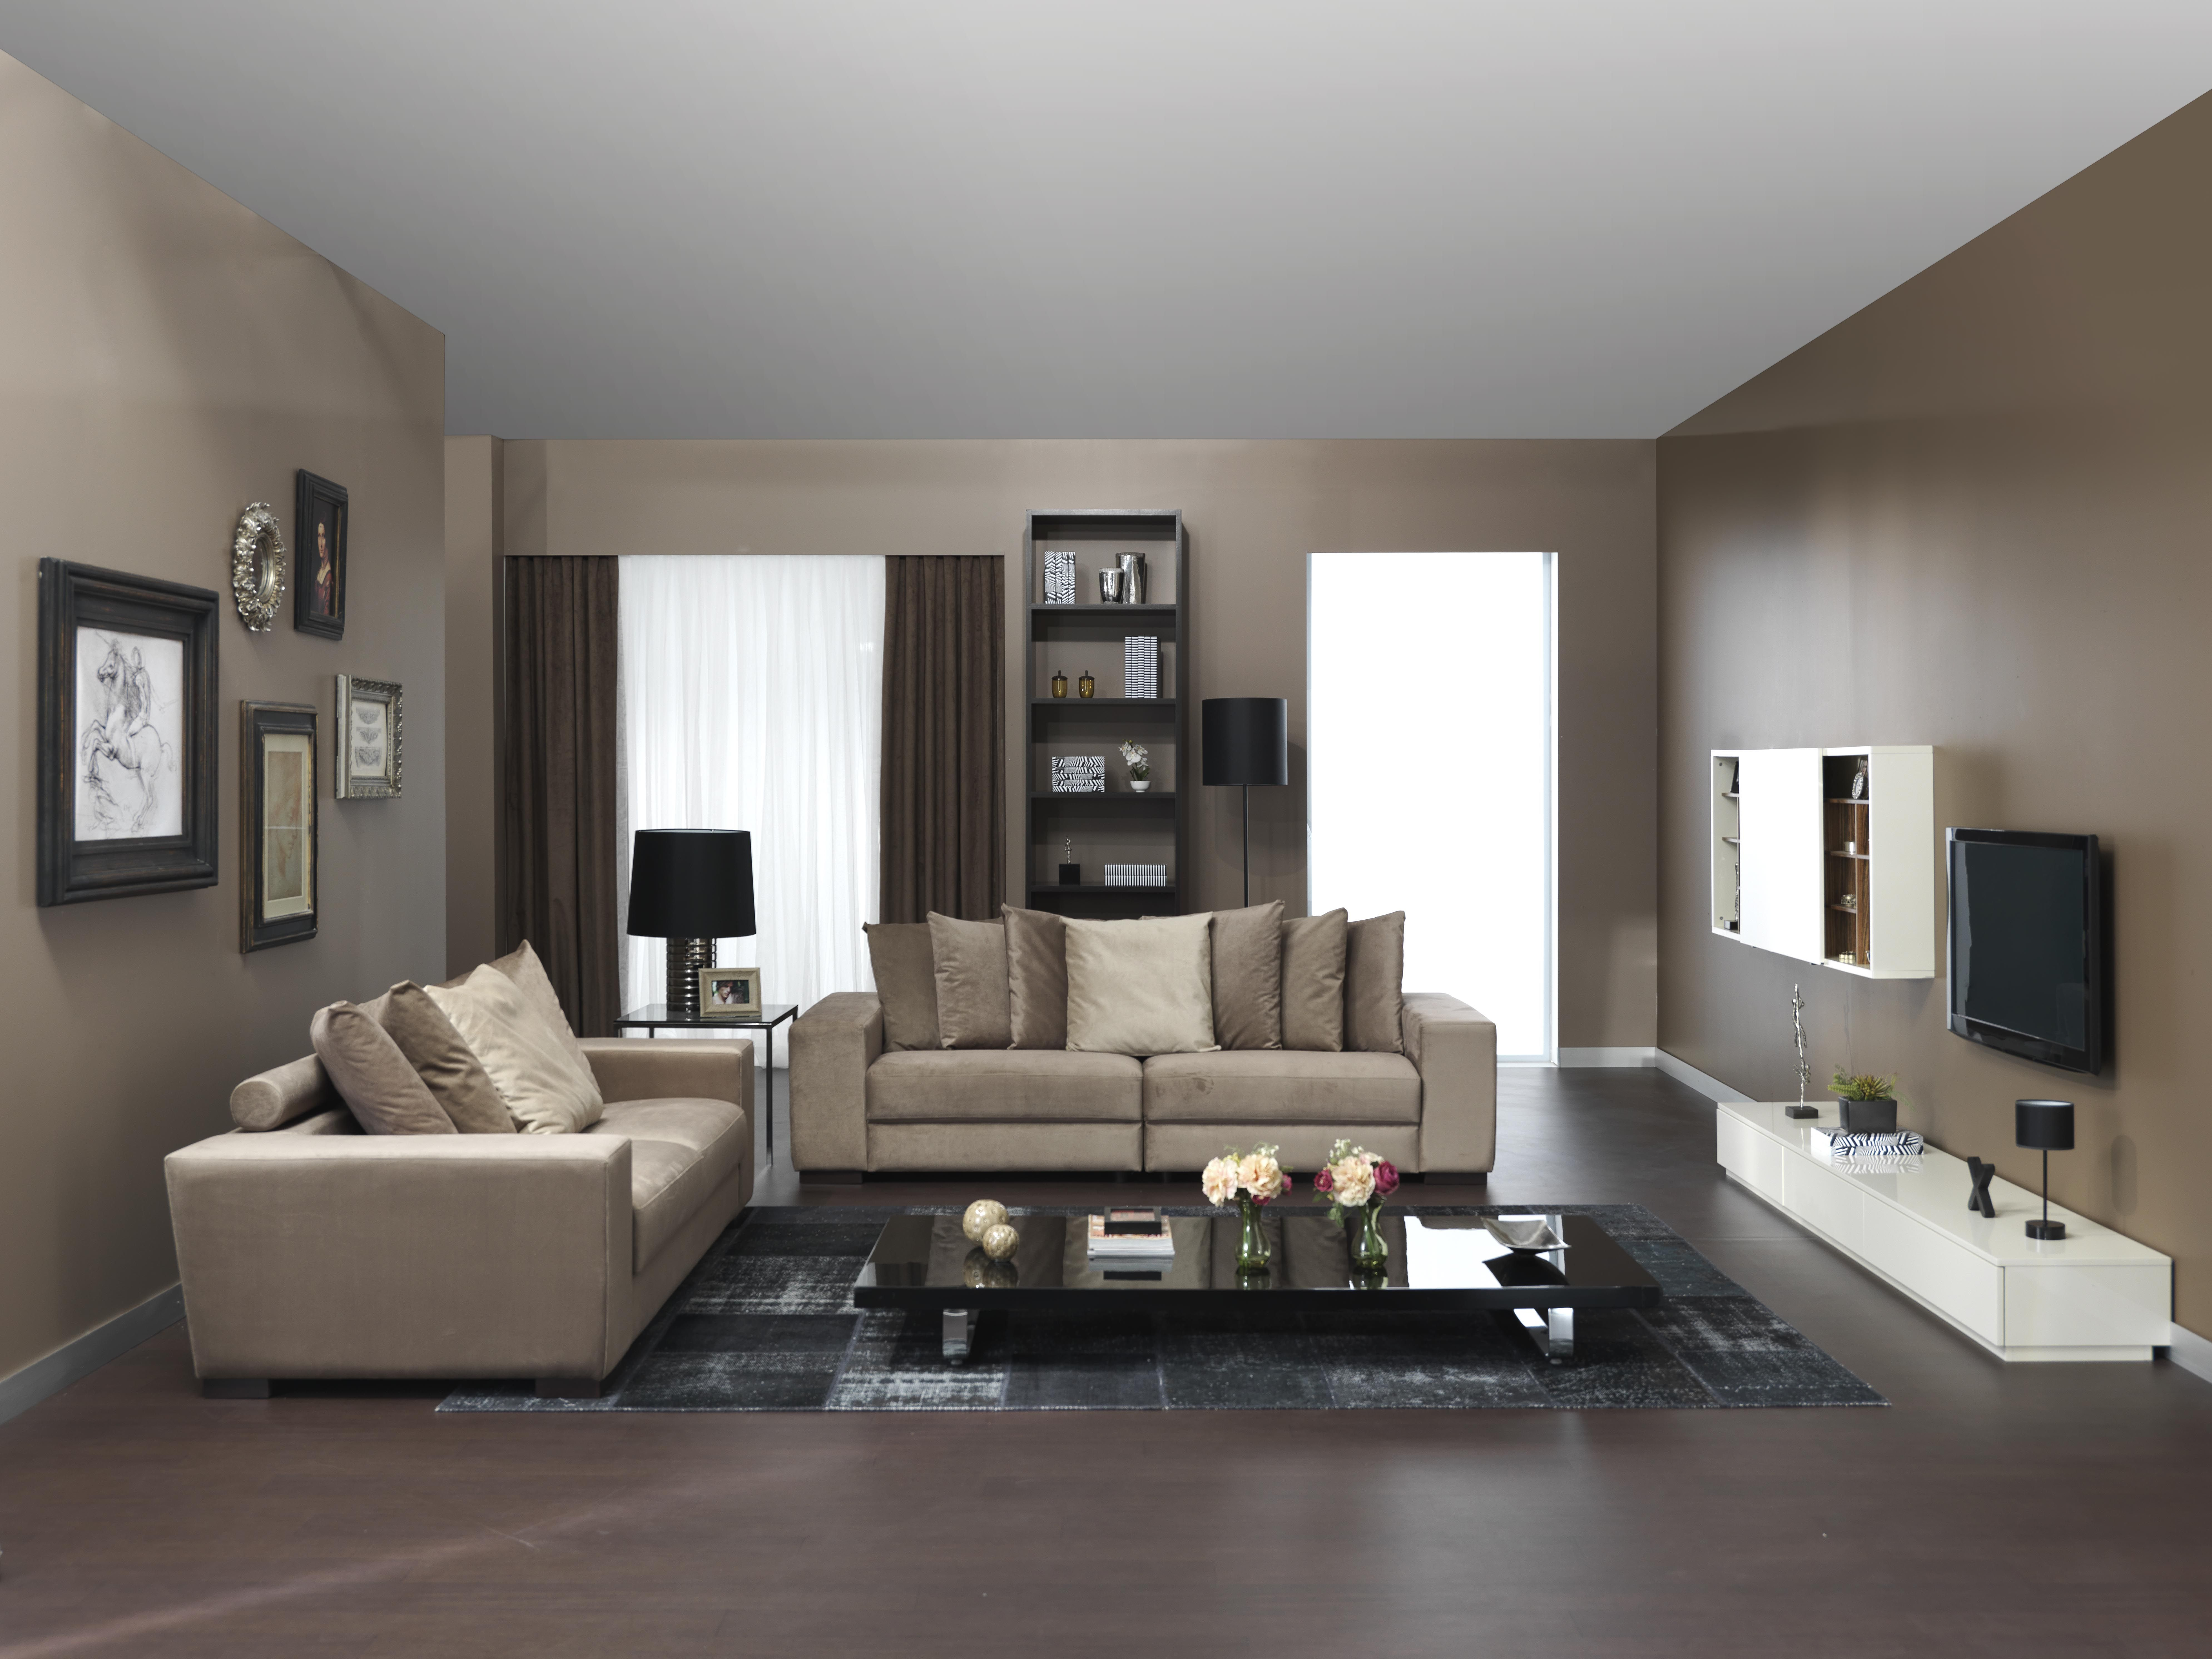 Premier Koltuk Takimi Tepehome Salontakimi Koltuk Kanepe Mobilya Evdekorasyonu Seat Sofa Furniture Homedecor Leatherseat Home Decor Home Furniture